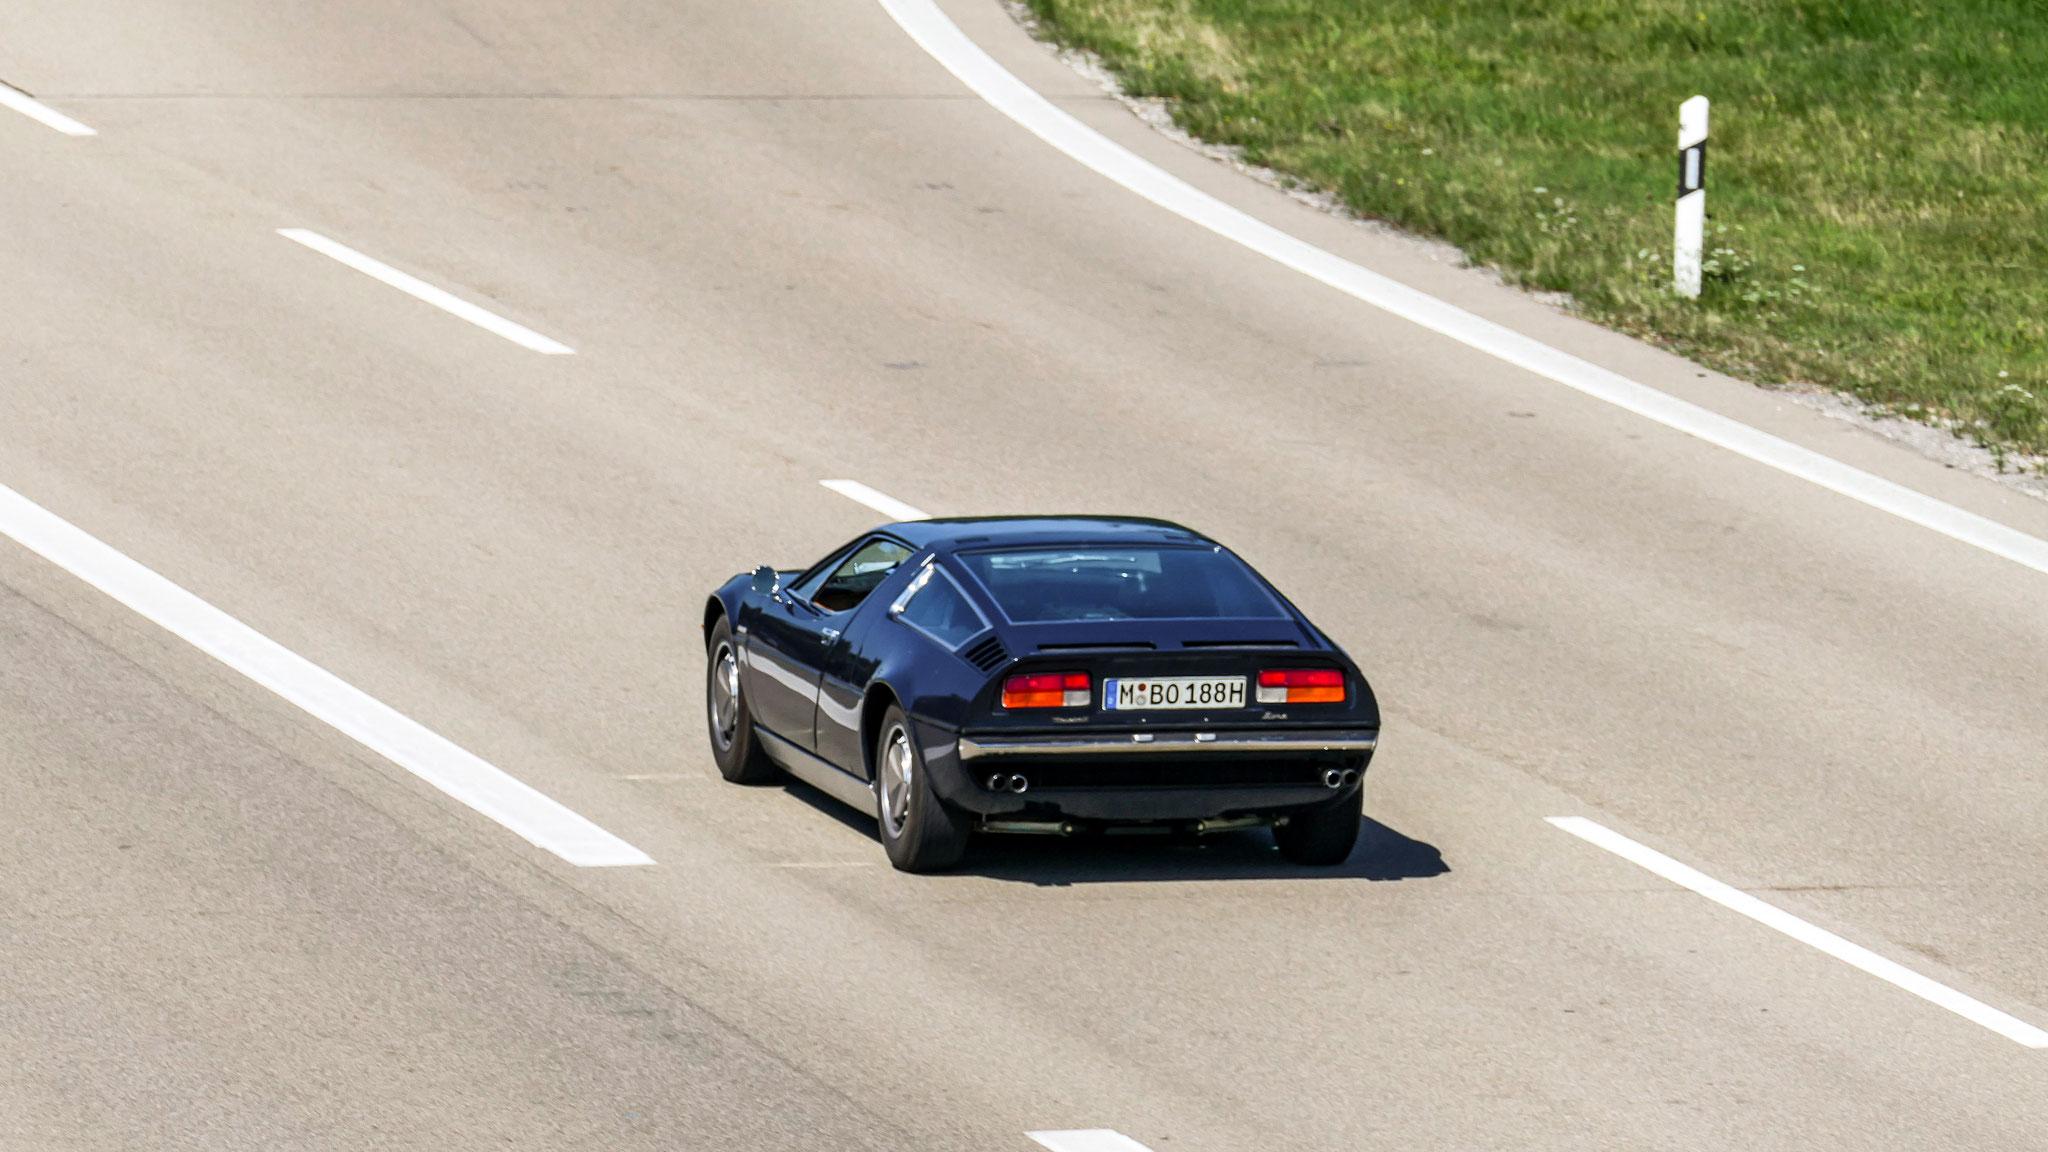 Maserati Bora - M-BO-188H